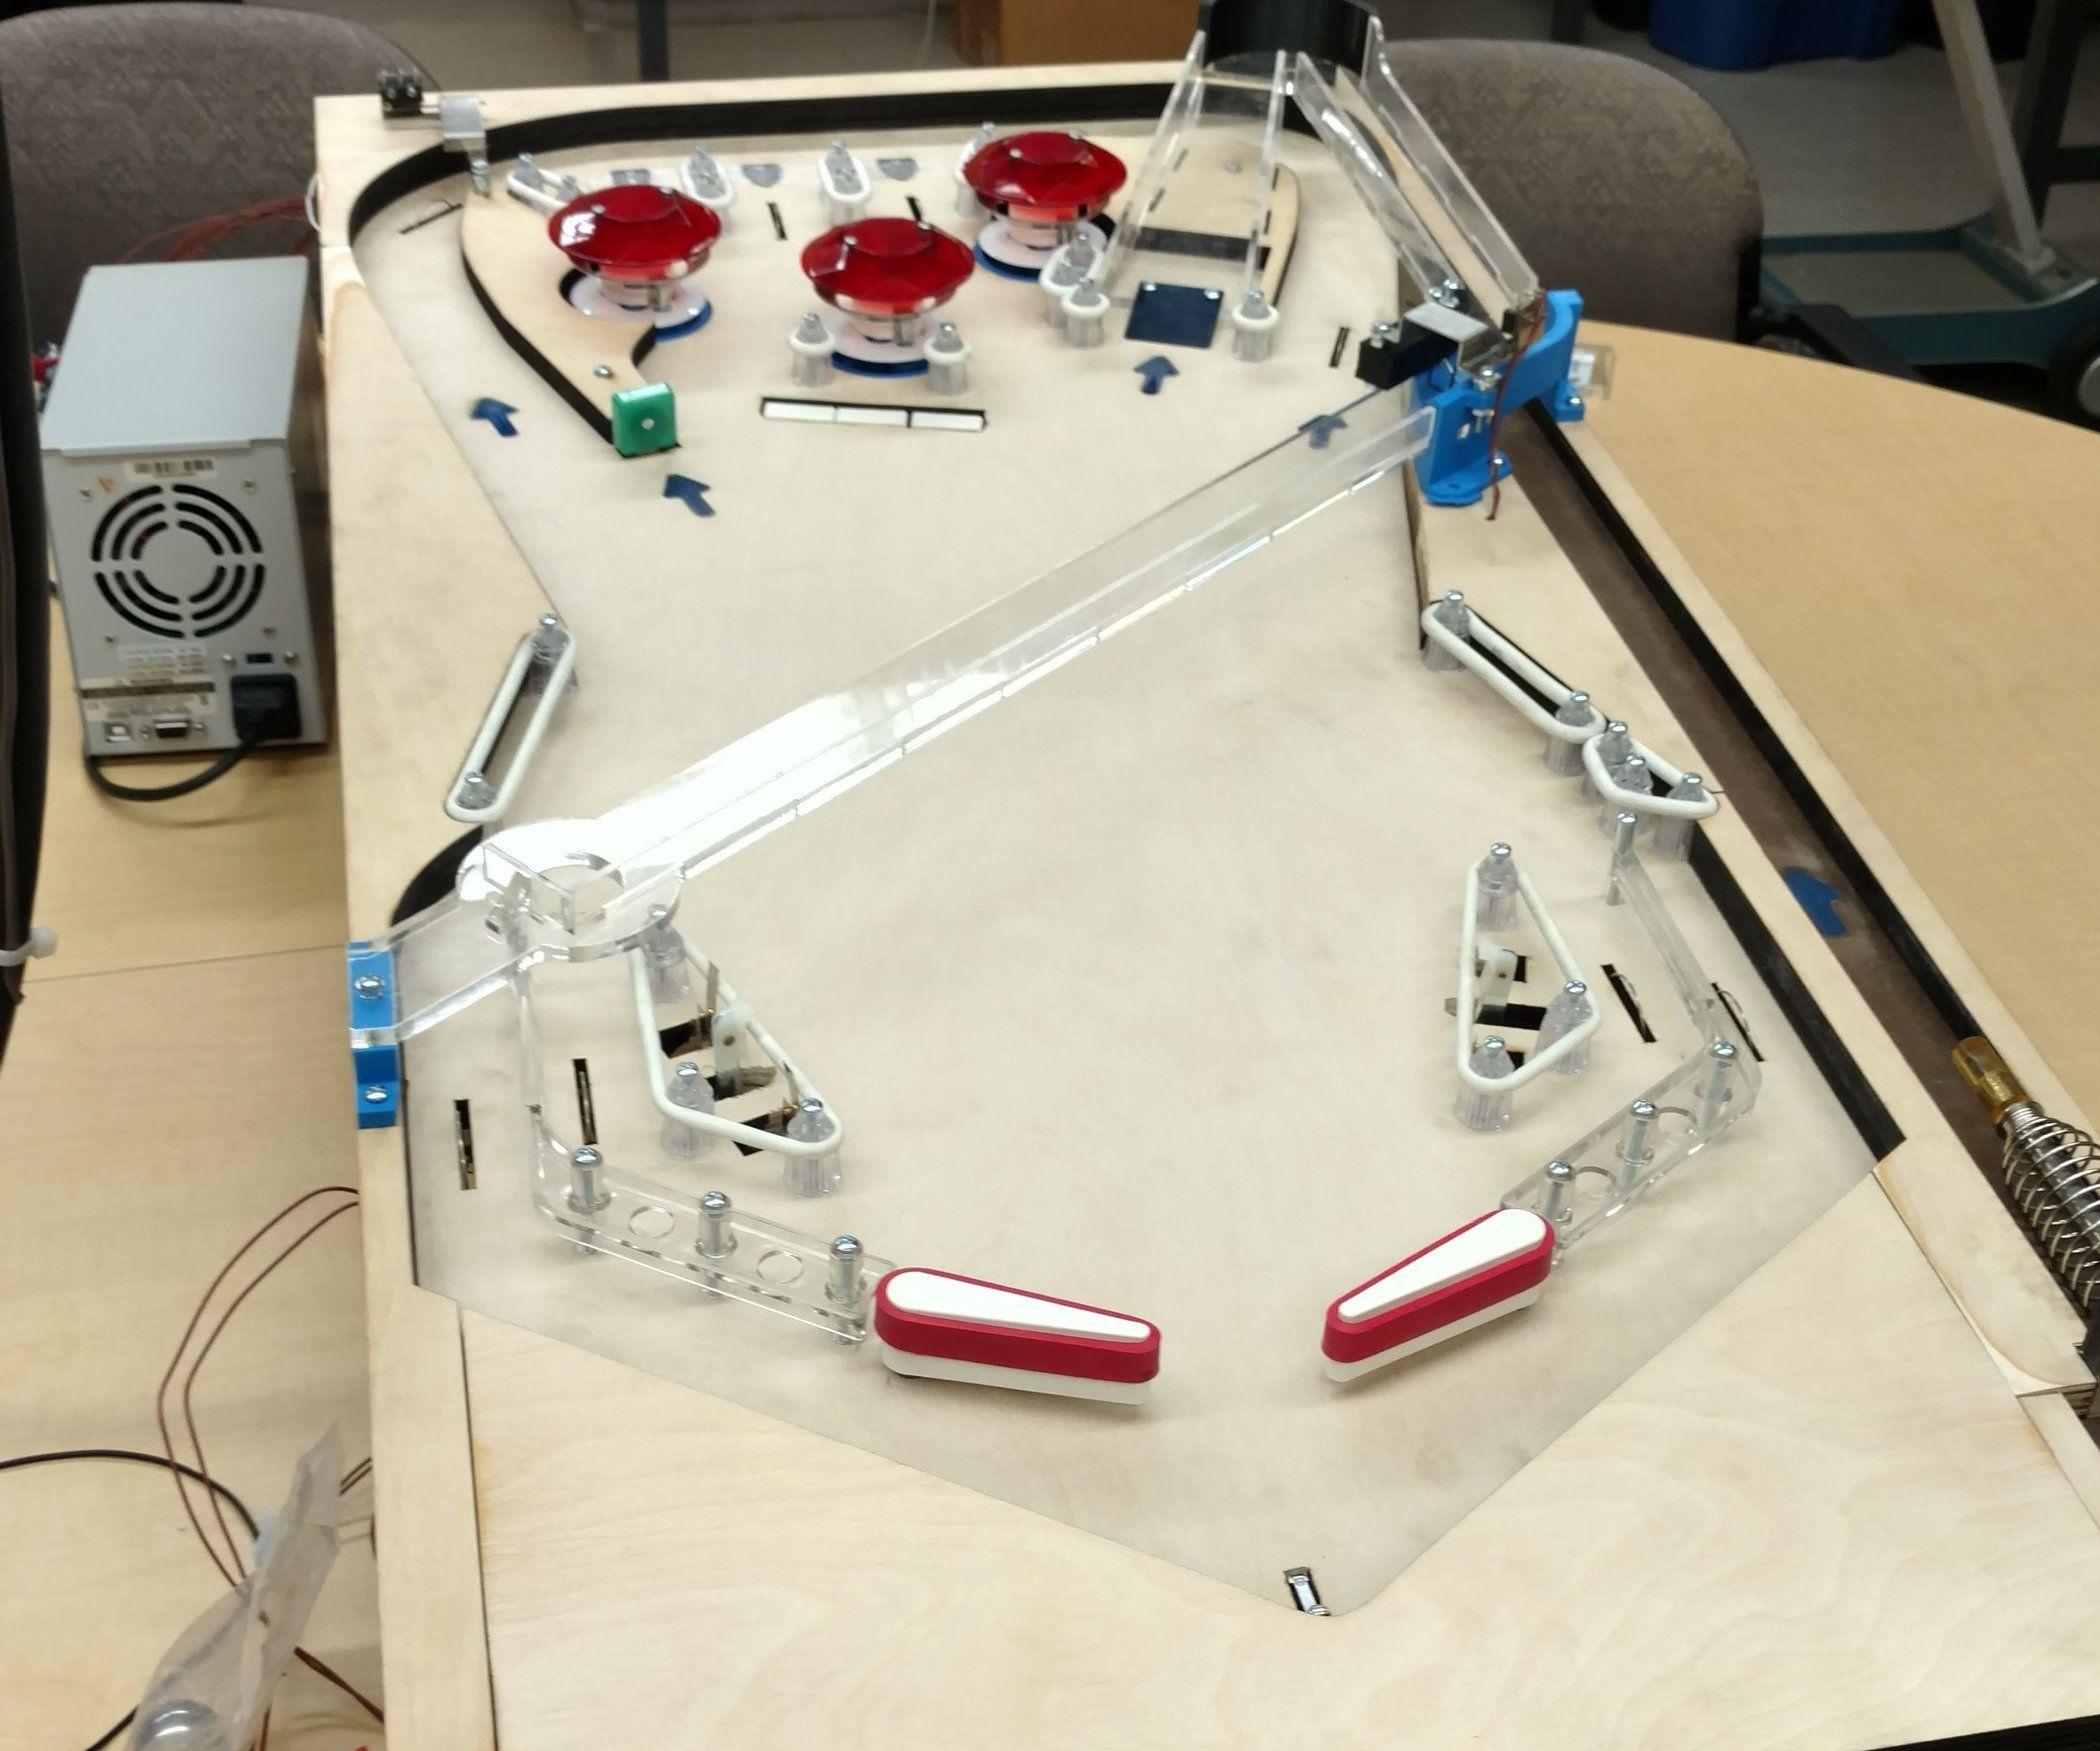 How to Build an Arduino Pinball Machine | Pinball, Arduino ...